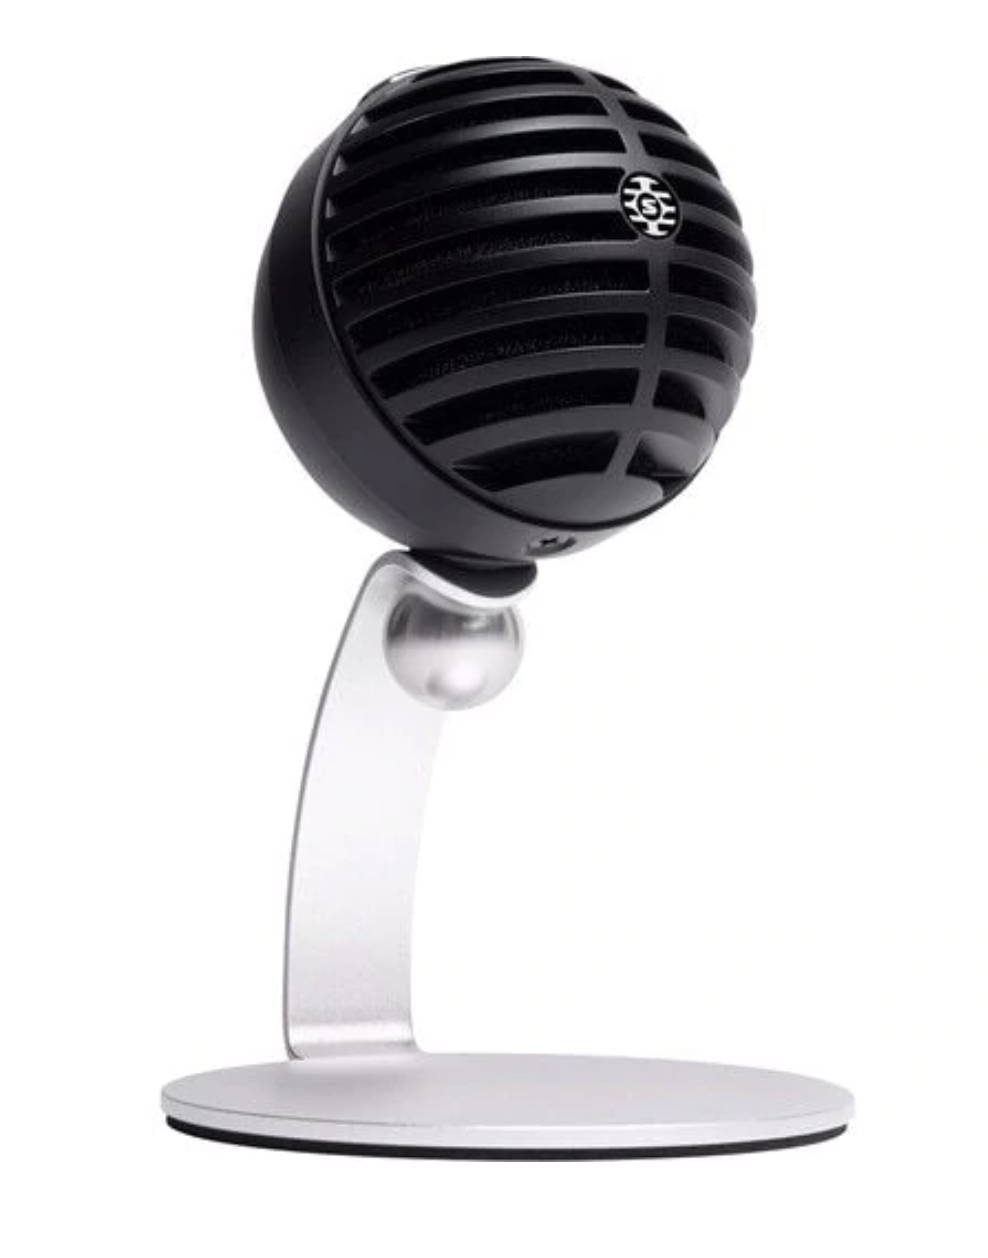 Shure MOTIV Series MV5C-USB Home-Office Microphone